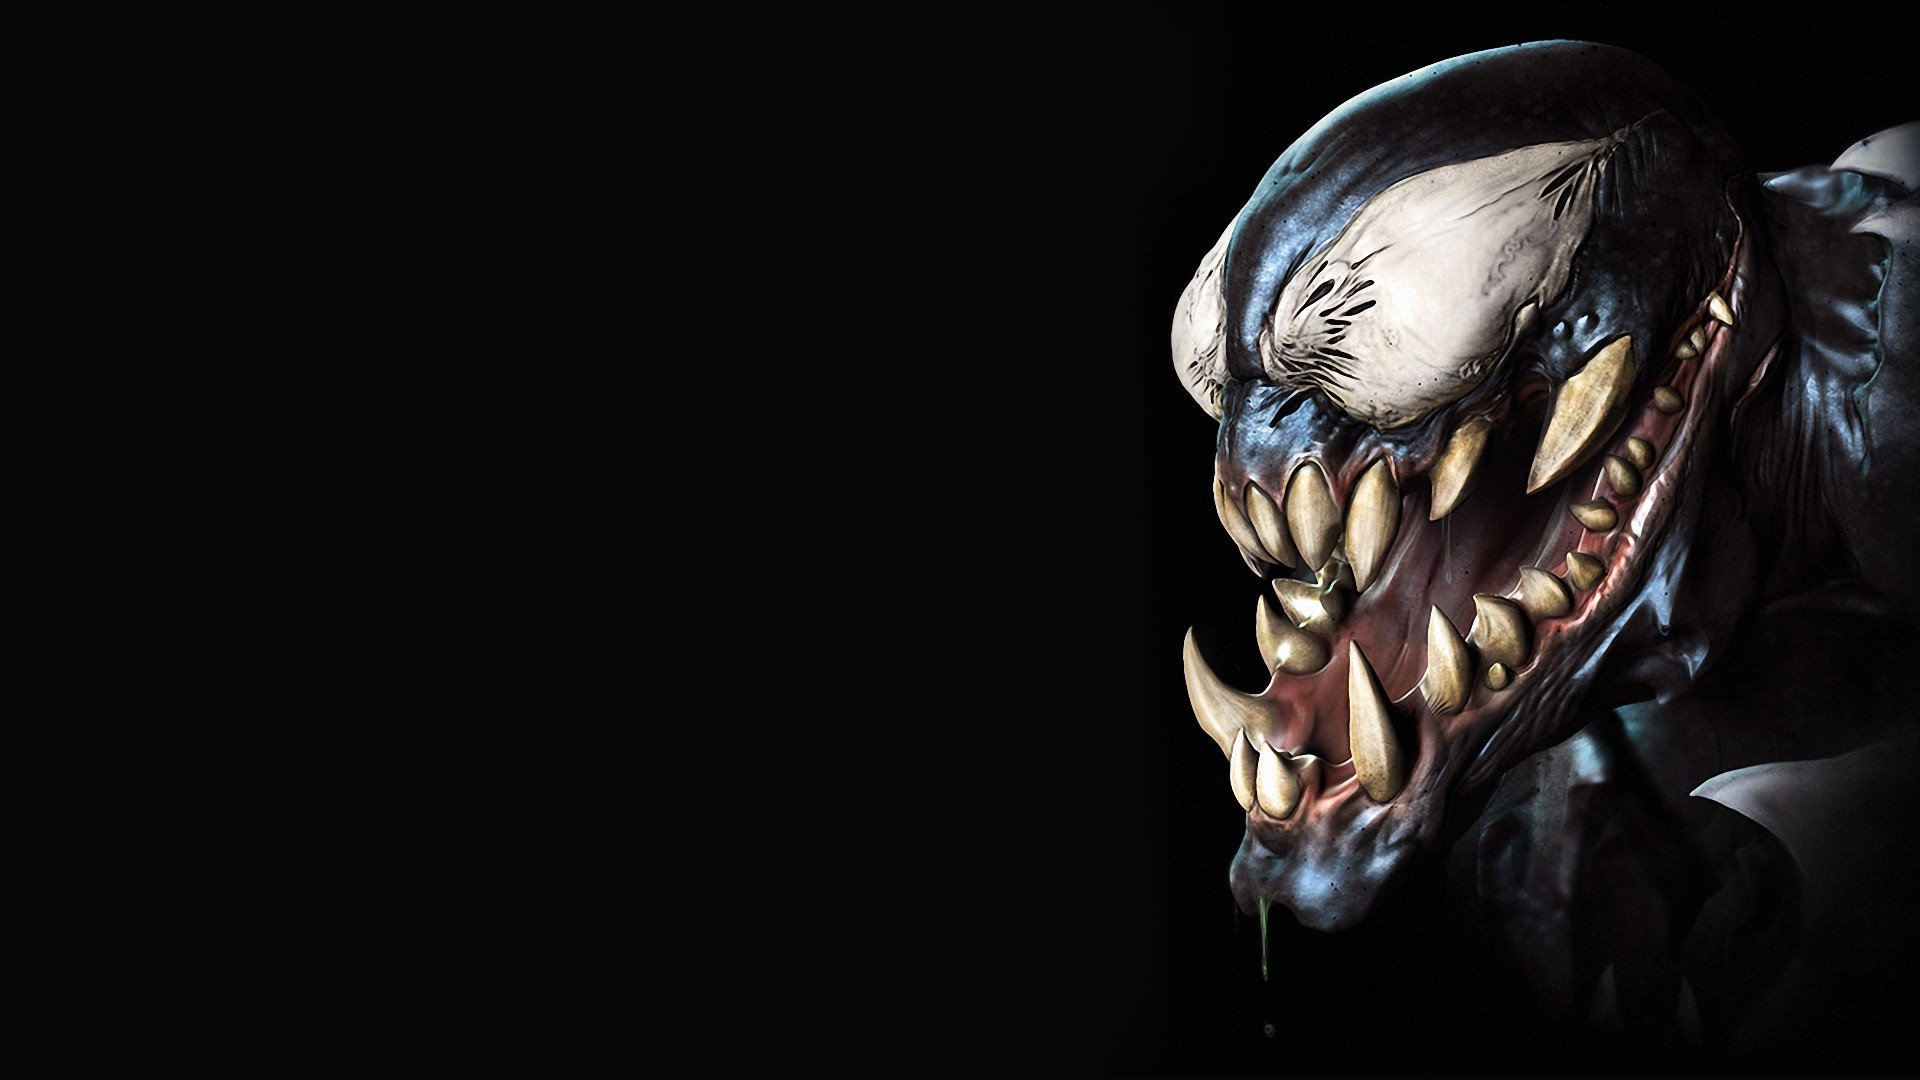 HD Agent Venom Wallpaper - WallpaperSafari